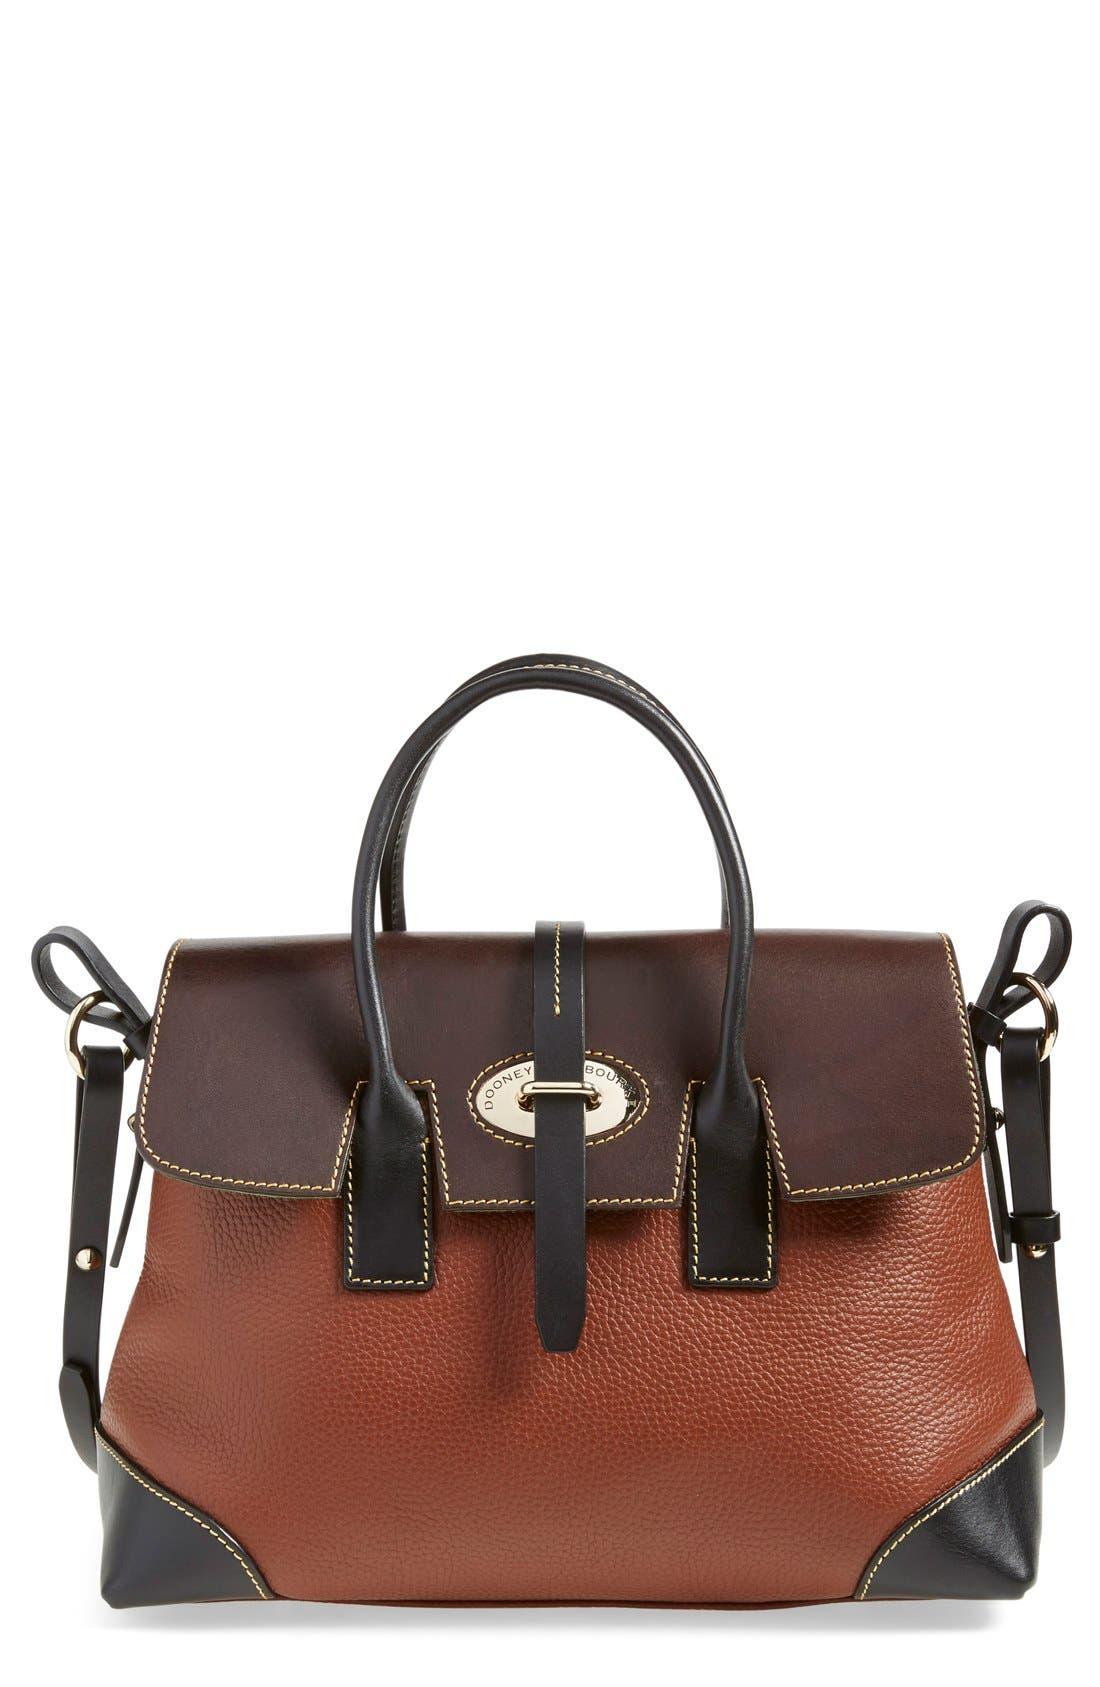 Main Image - Dooney & Bourke 'Verona Large Elisa' Grained Leather Satchel